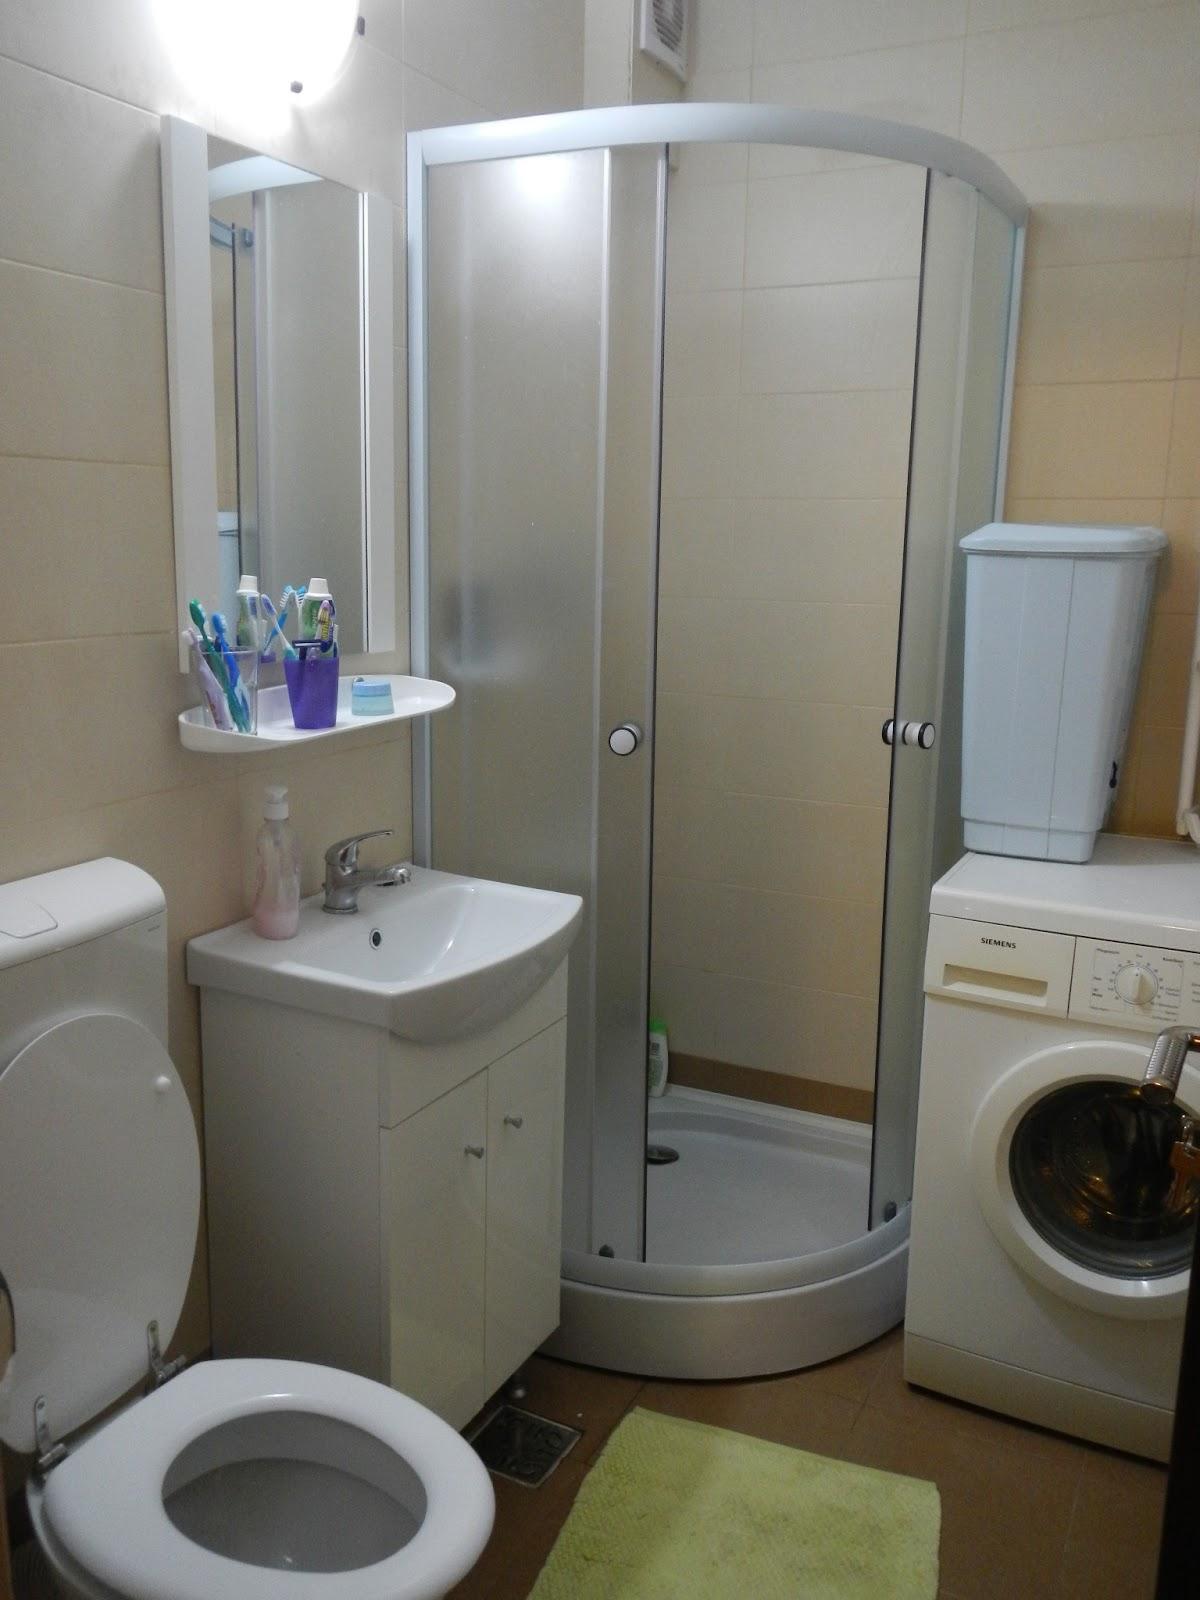 Grila design amenajare baie apartament gruia for Amenajare baie garsoniera